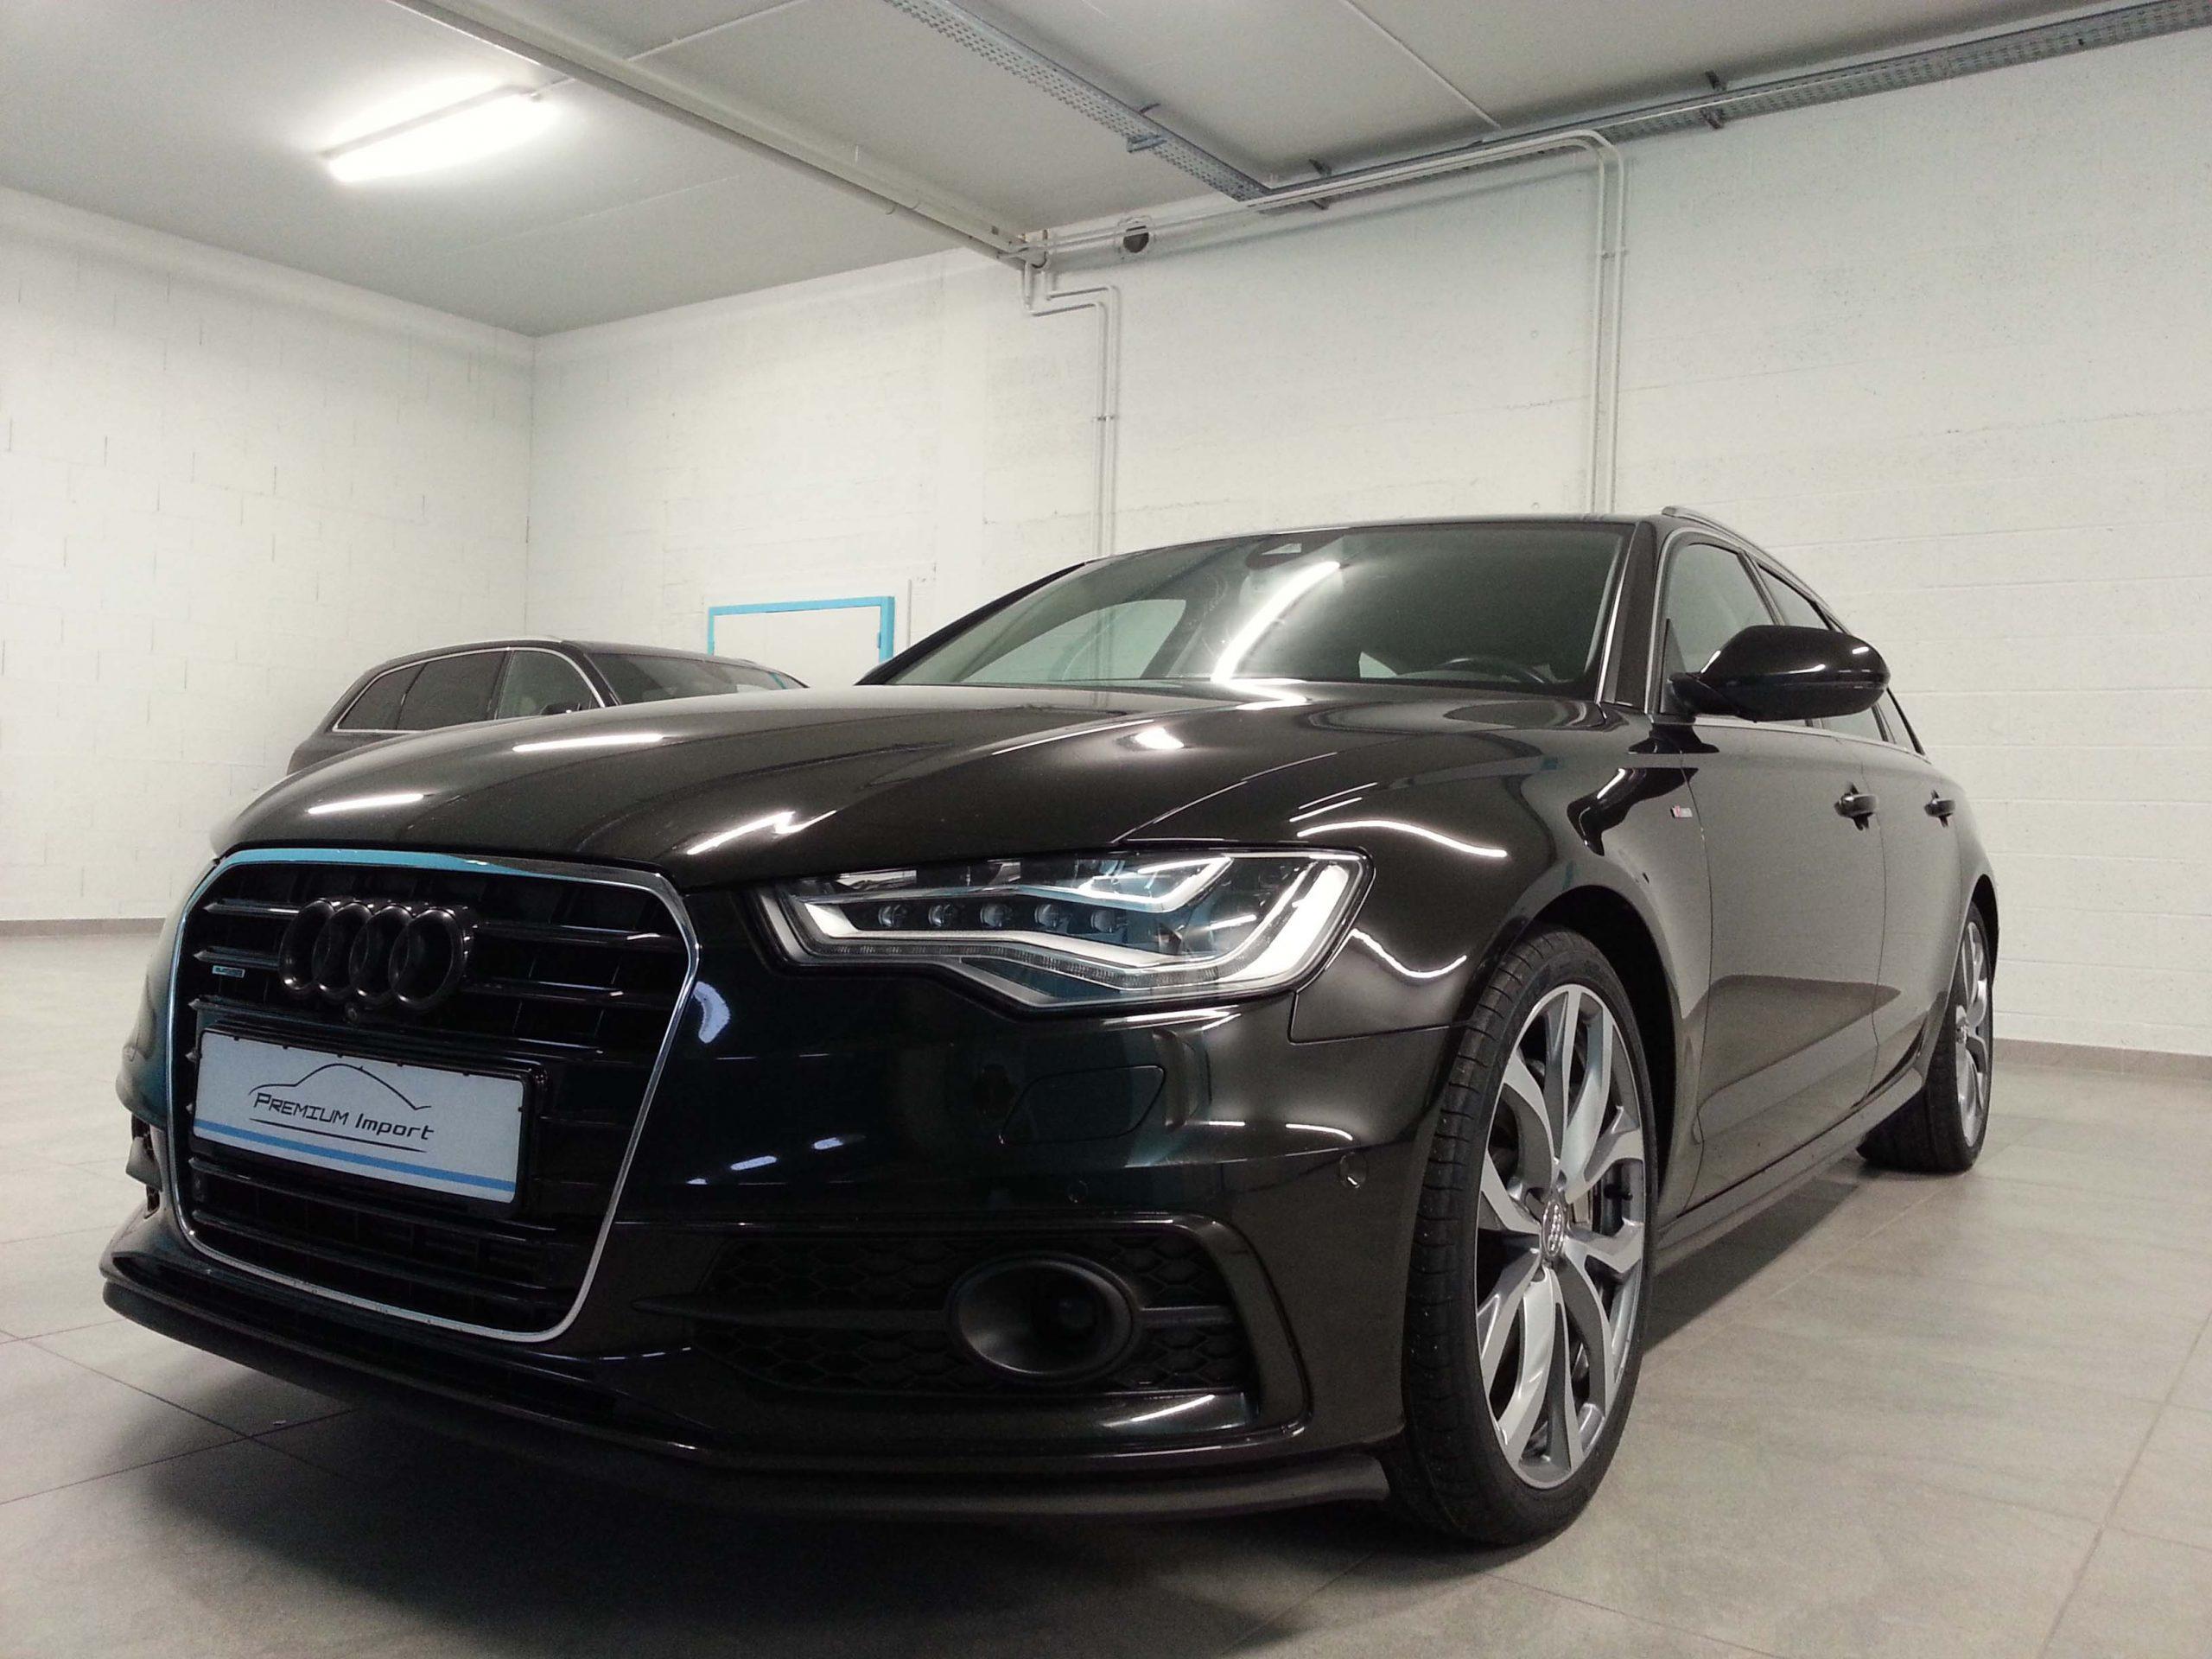 Audi A6 Avant 3.0 TDI 313 ch